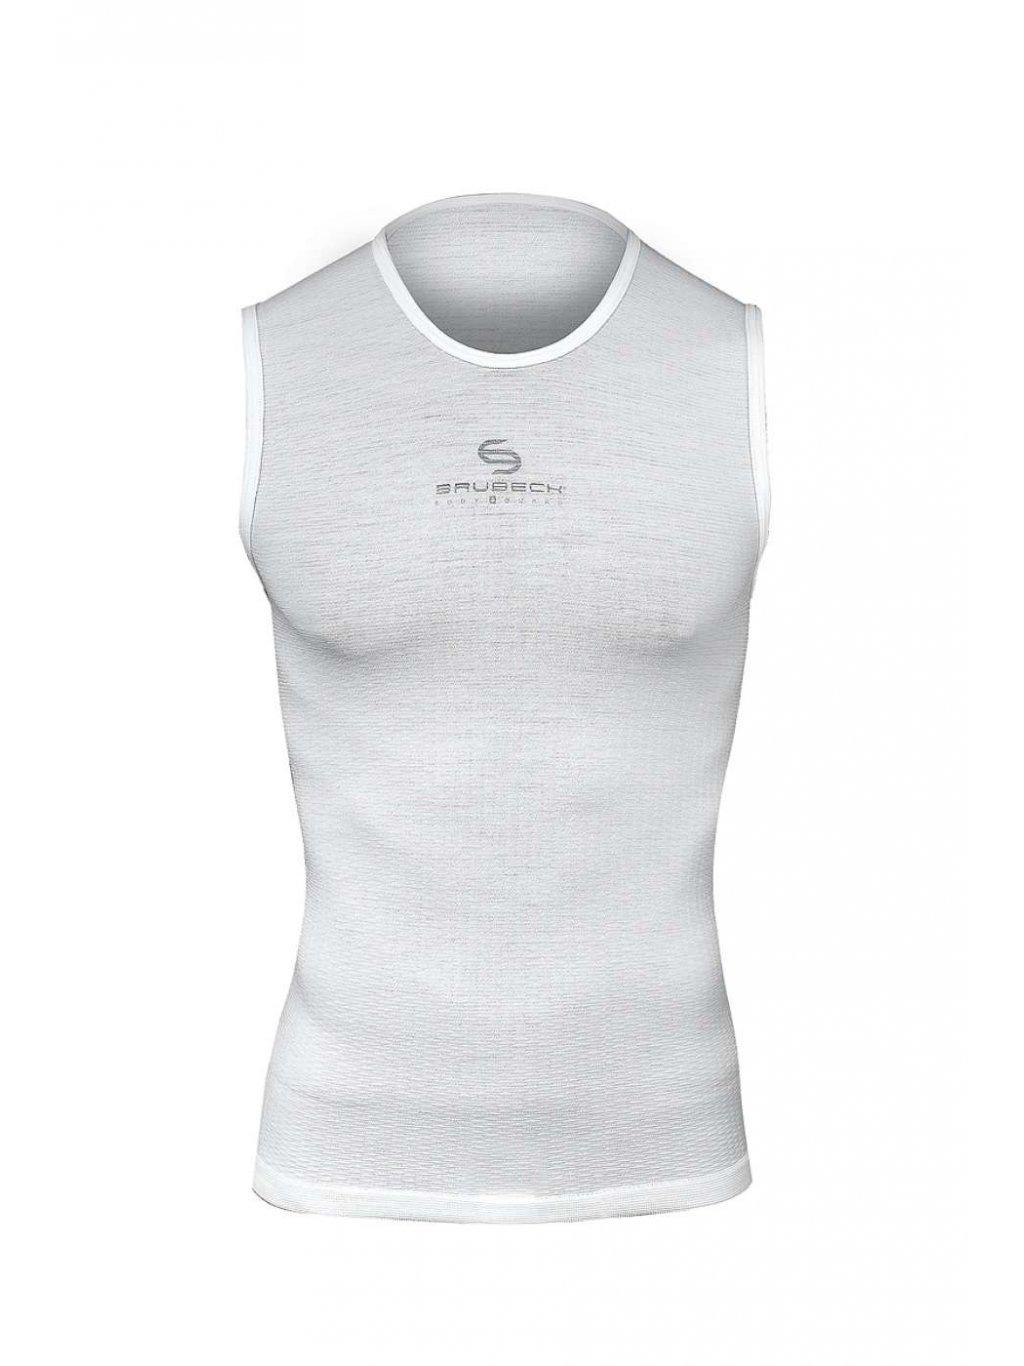 Brubeck UNISEX tričko 3D bez rukávů Multifunctional